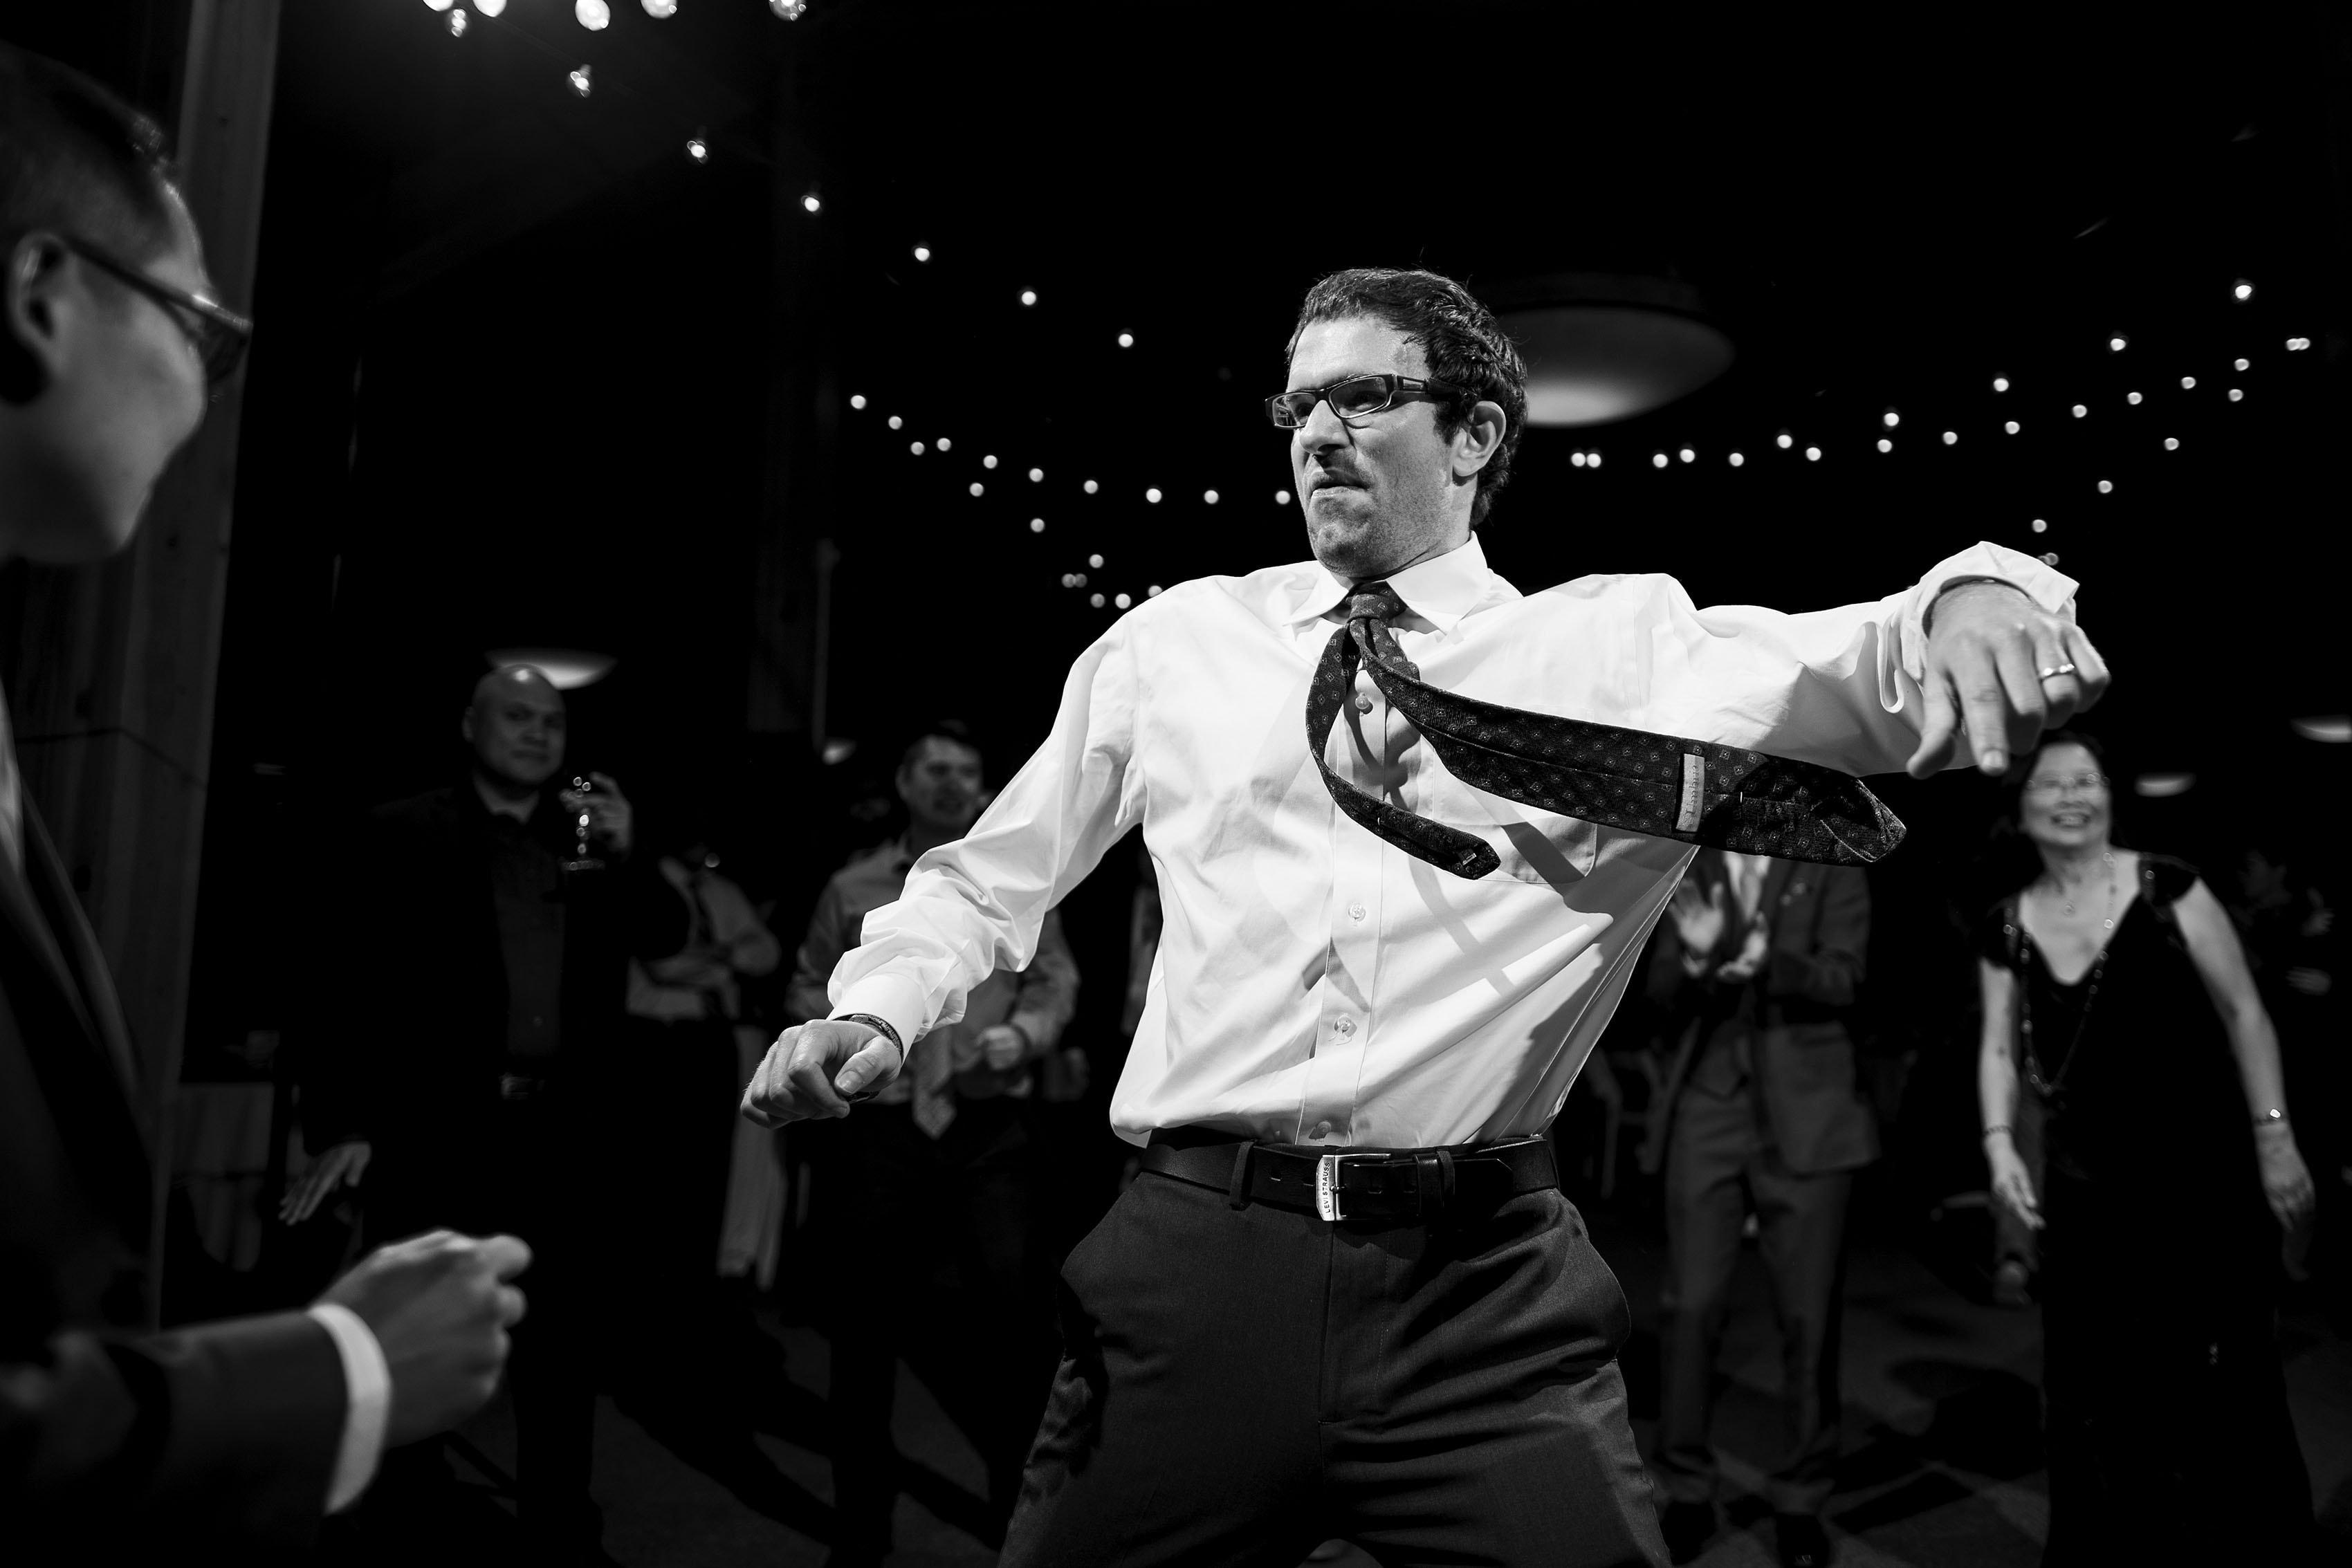 Wedding guests dance at A Basin